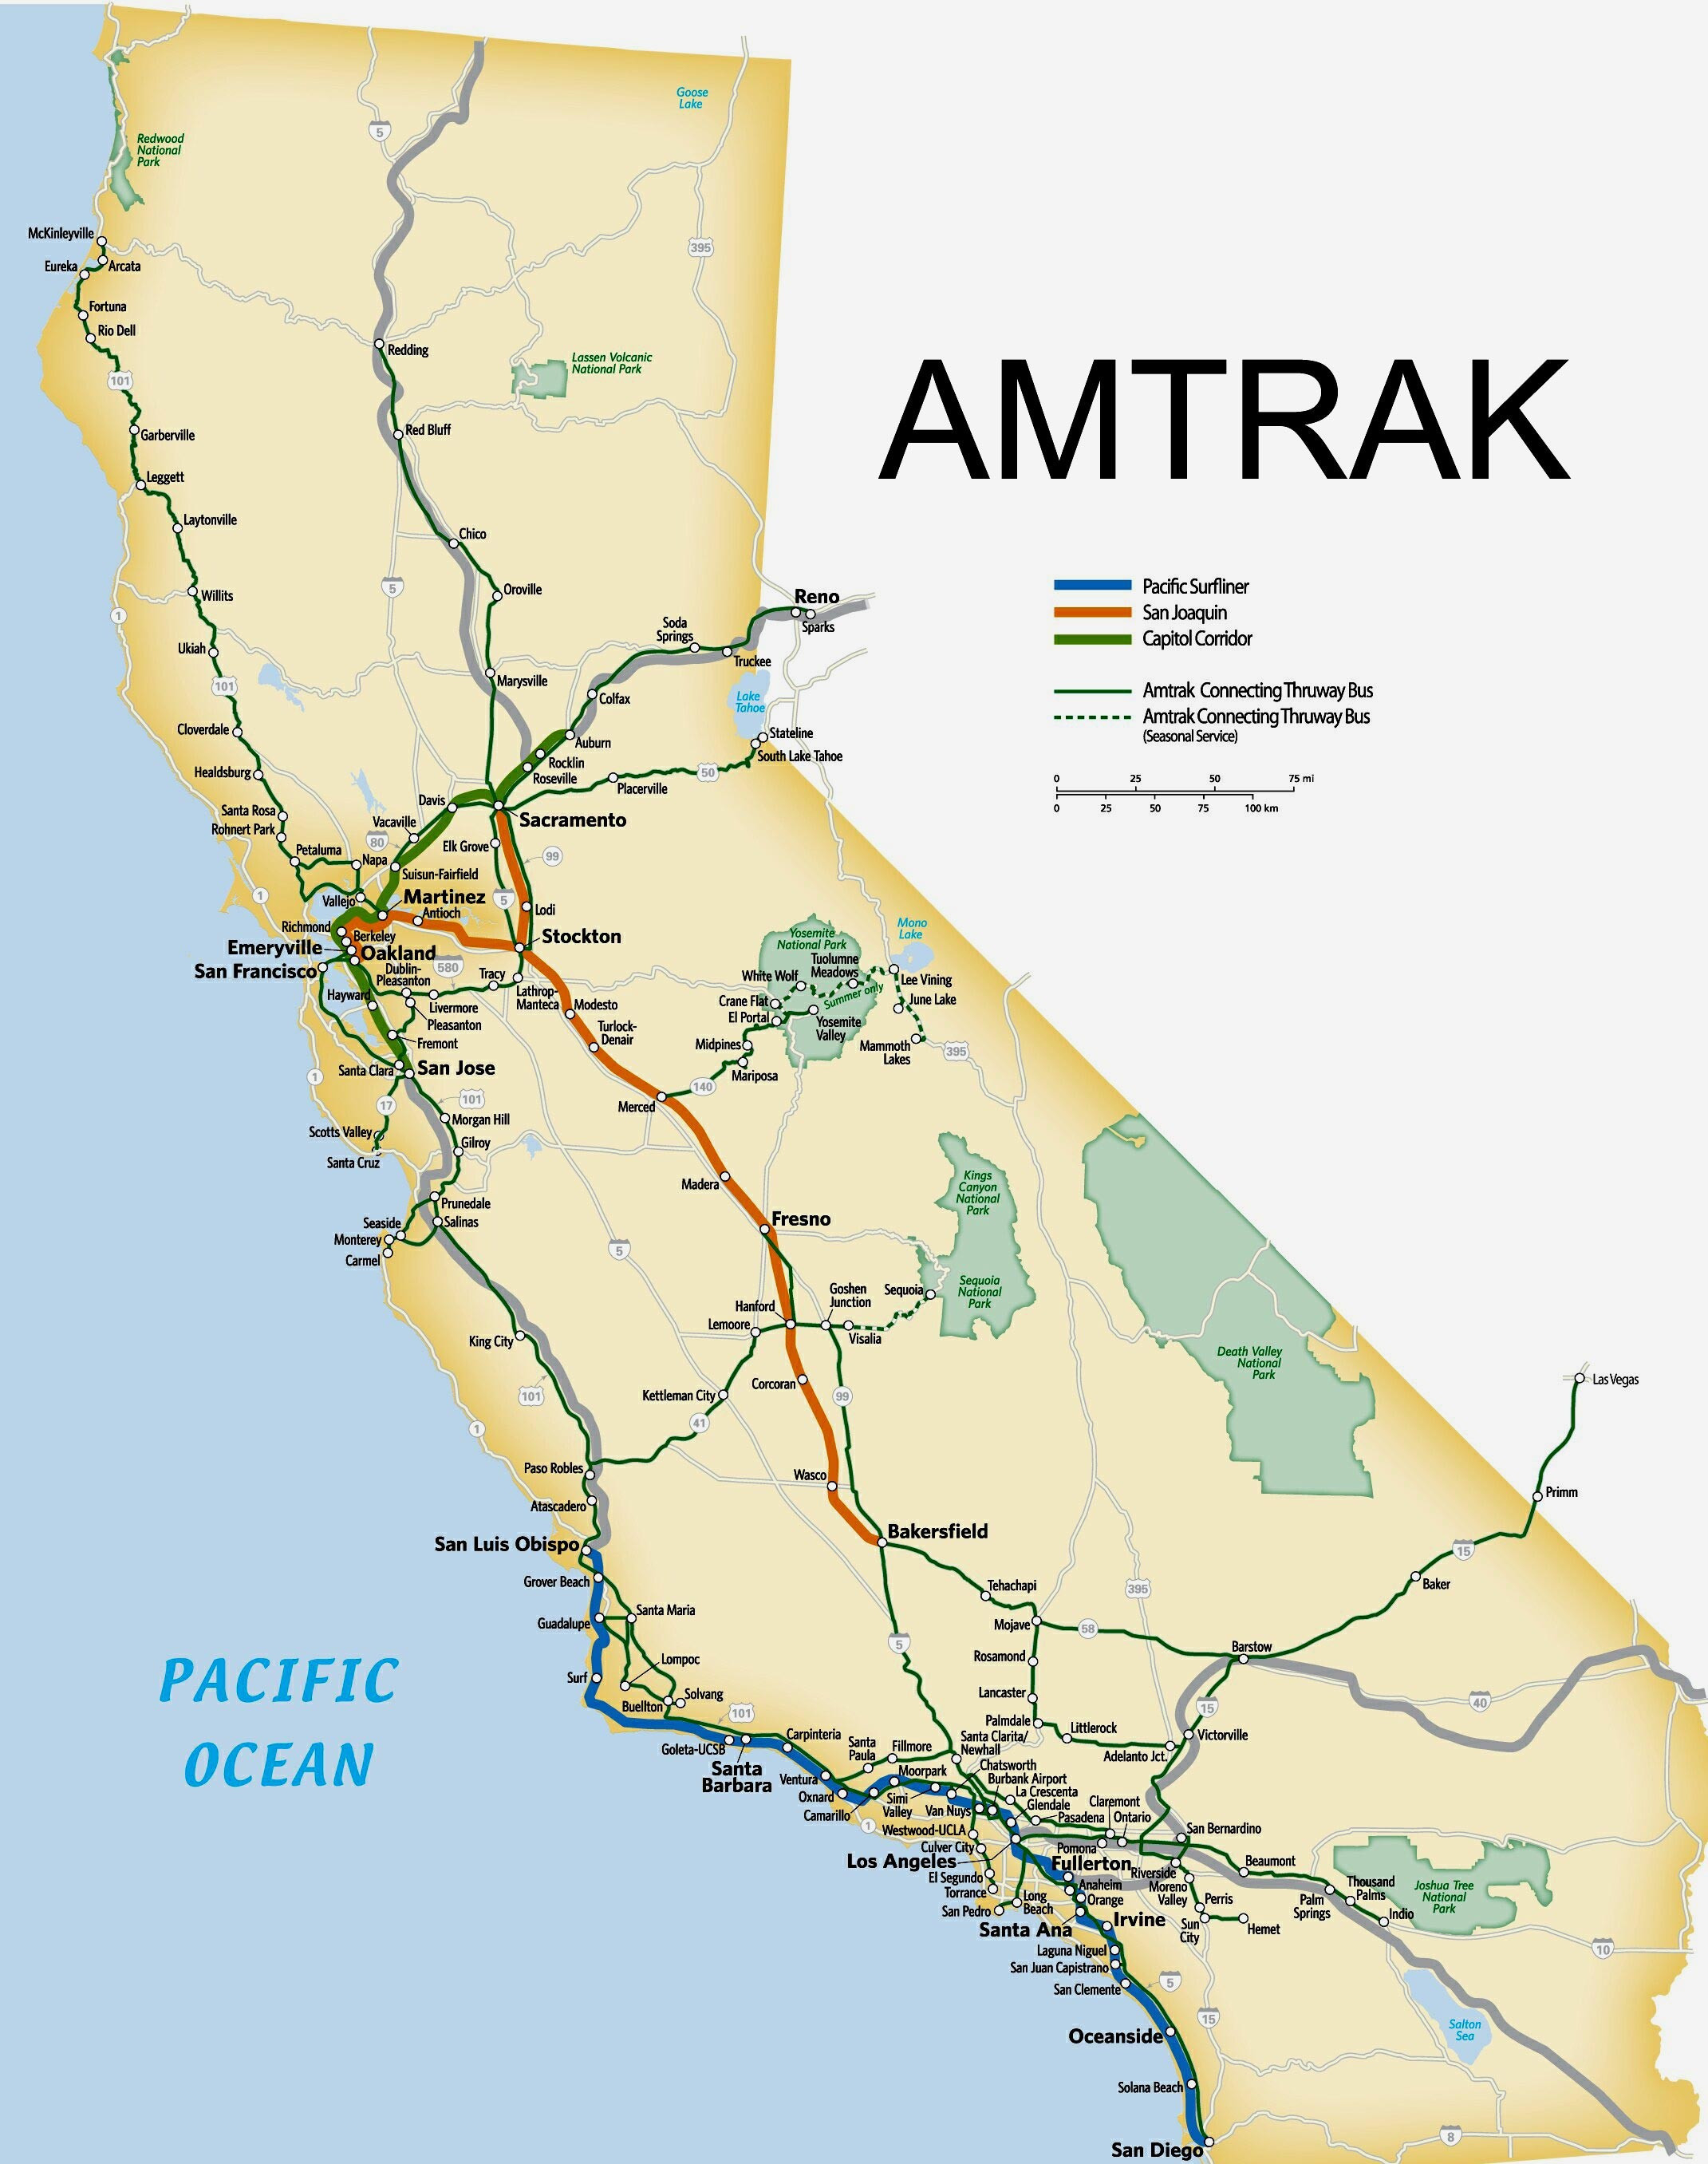 California Amtrak Stations Map - Ettcarworld - Amtrak Station Map California